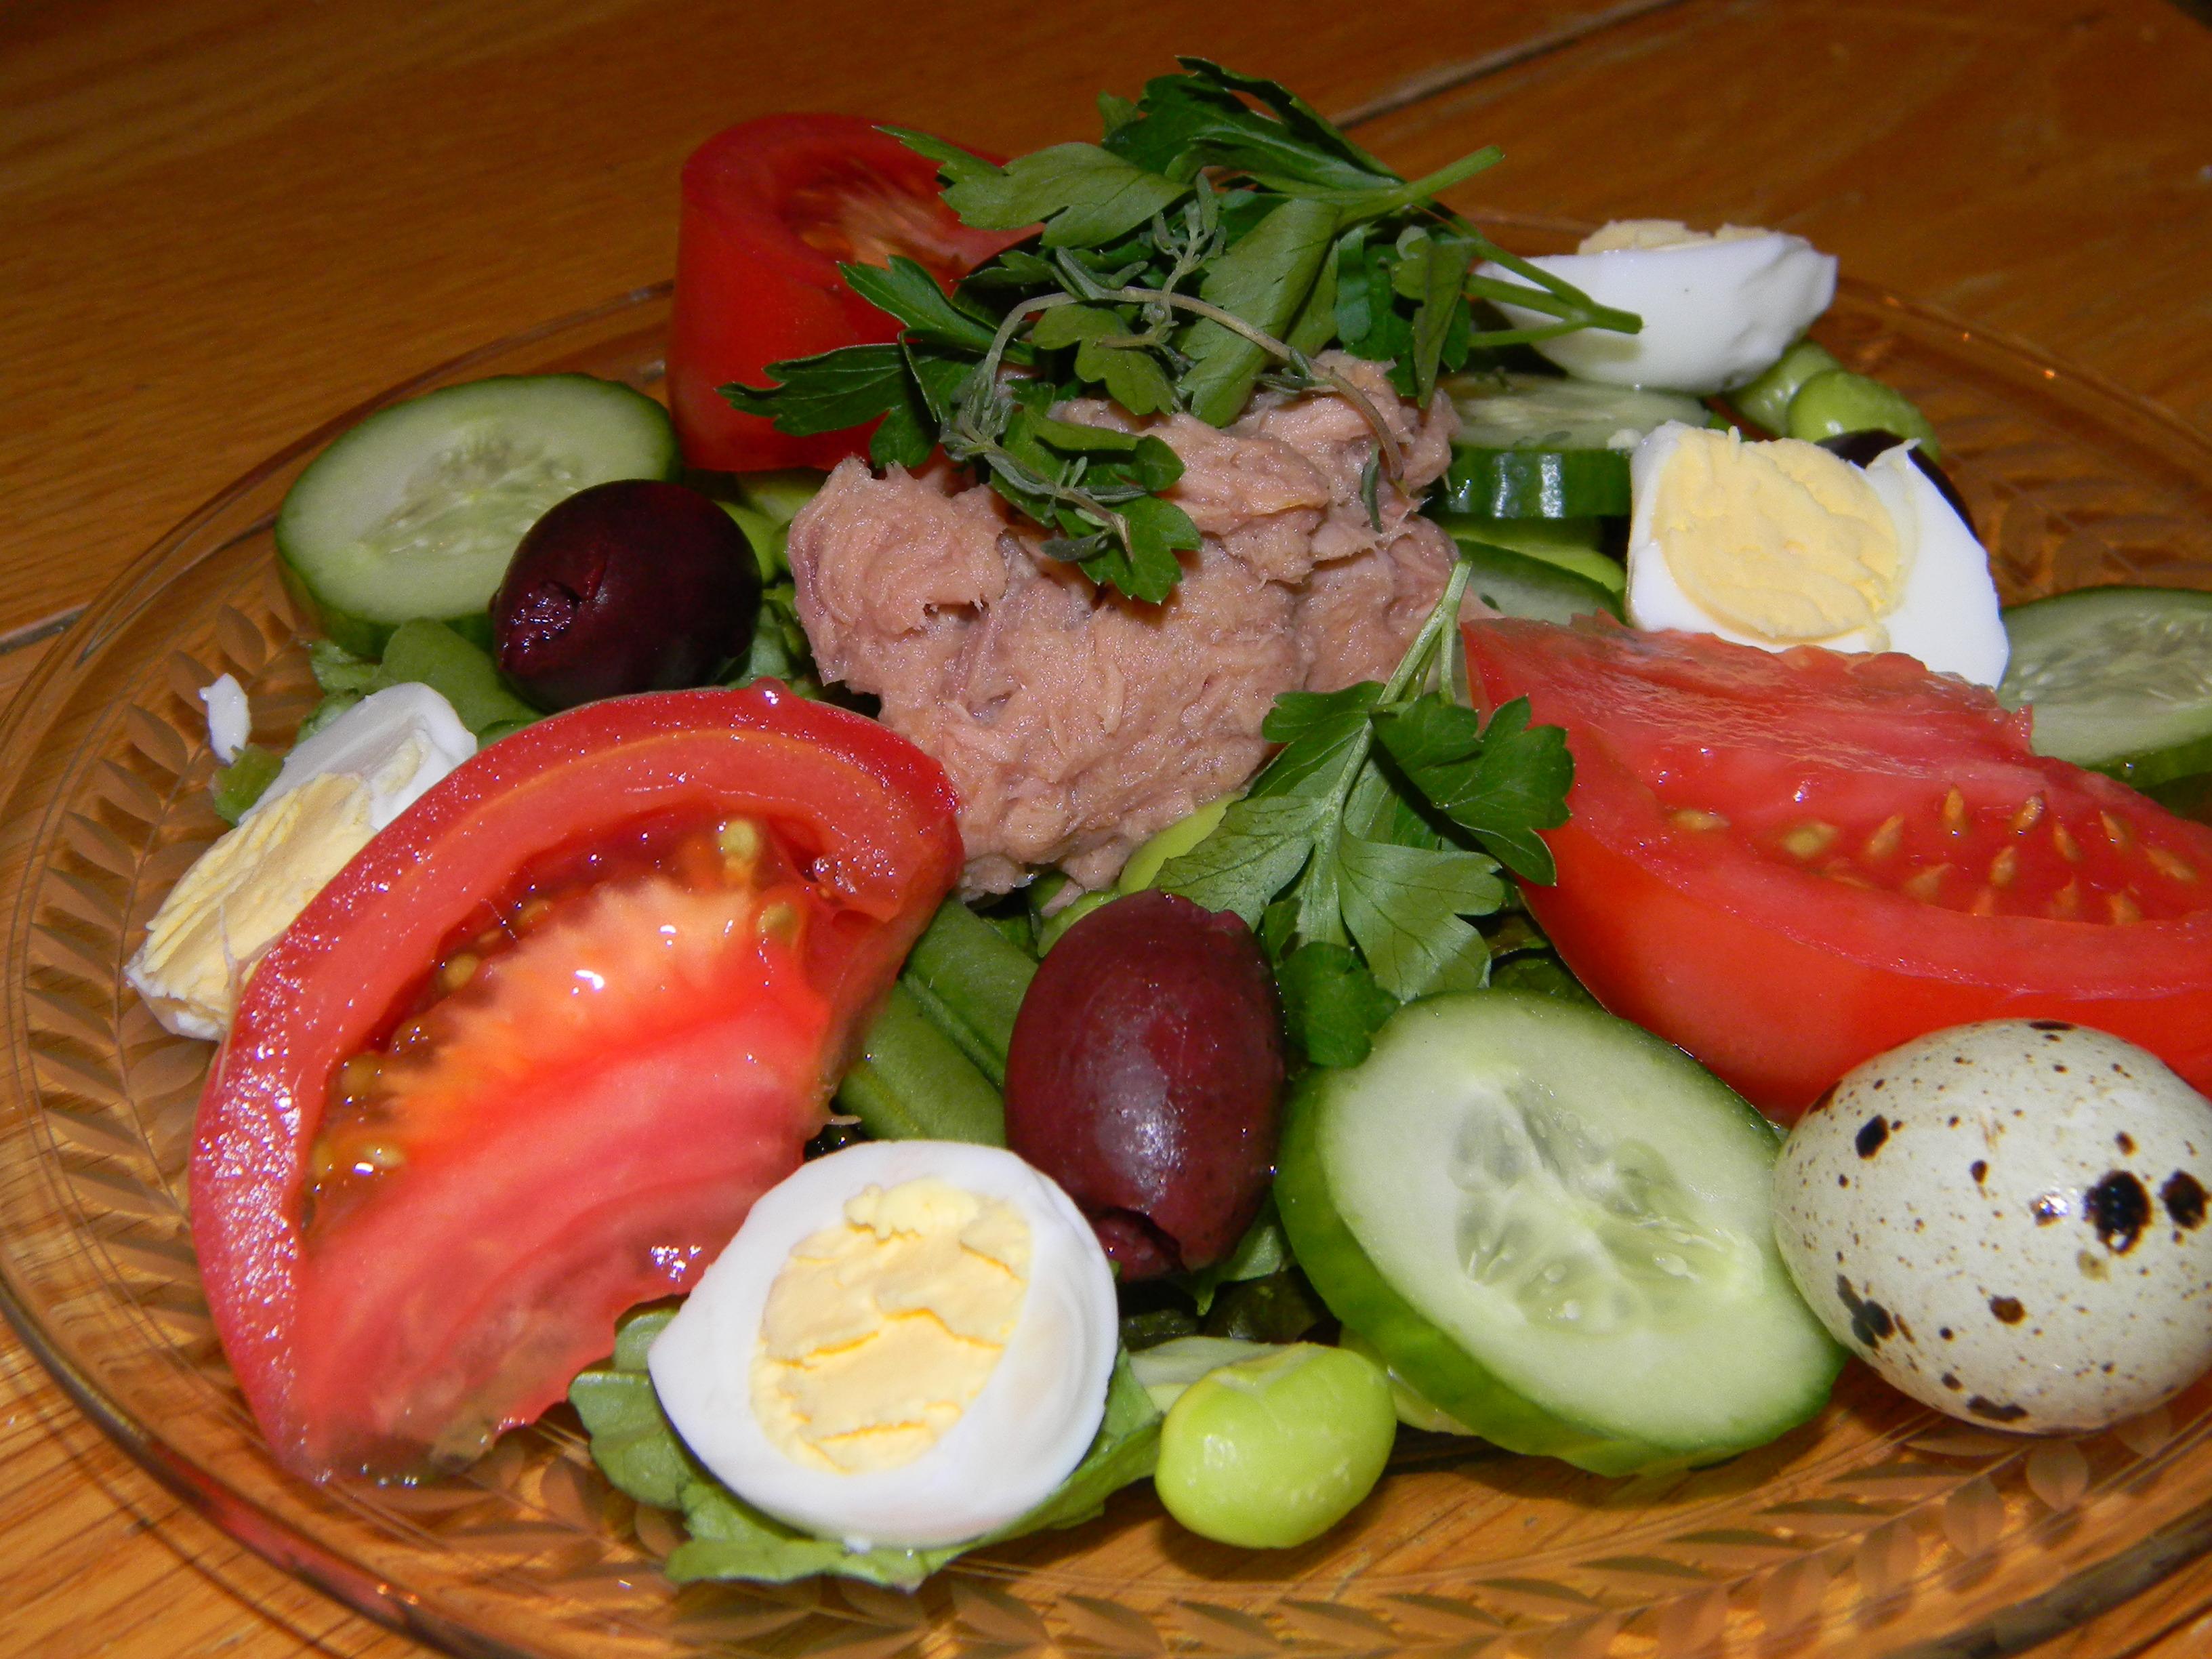 Classic Salade Niçoise Recipes — Dishmaps